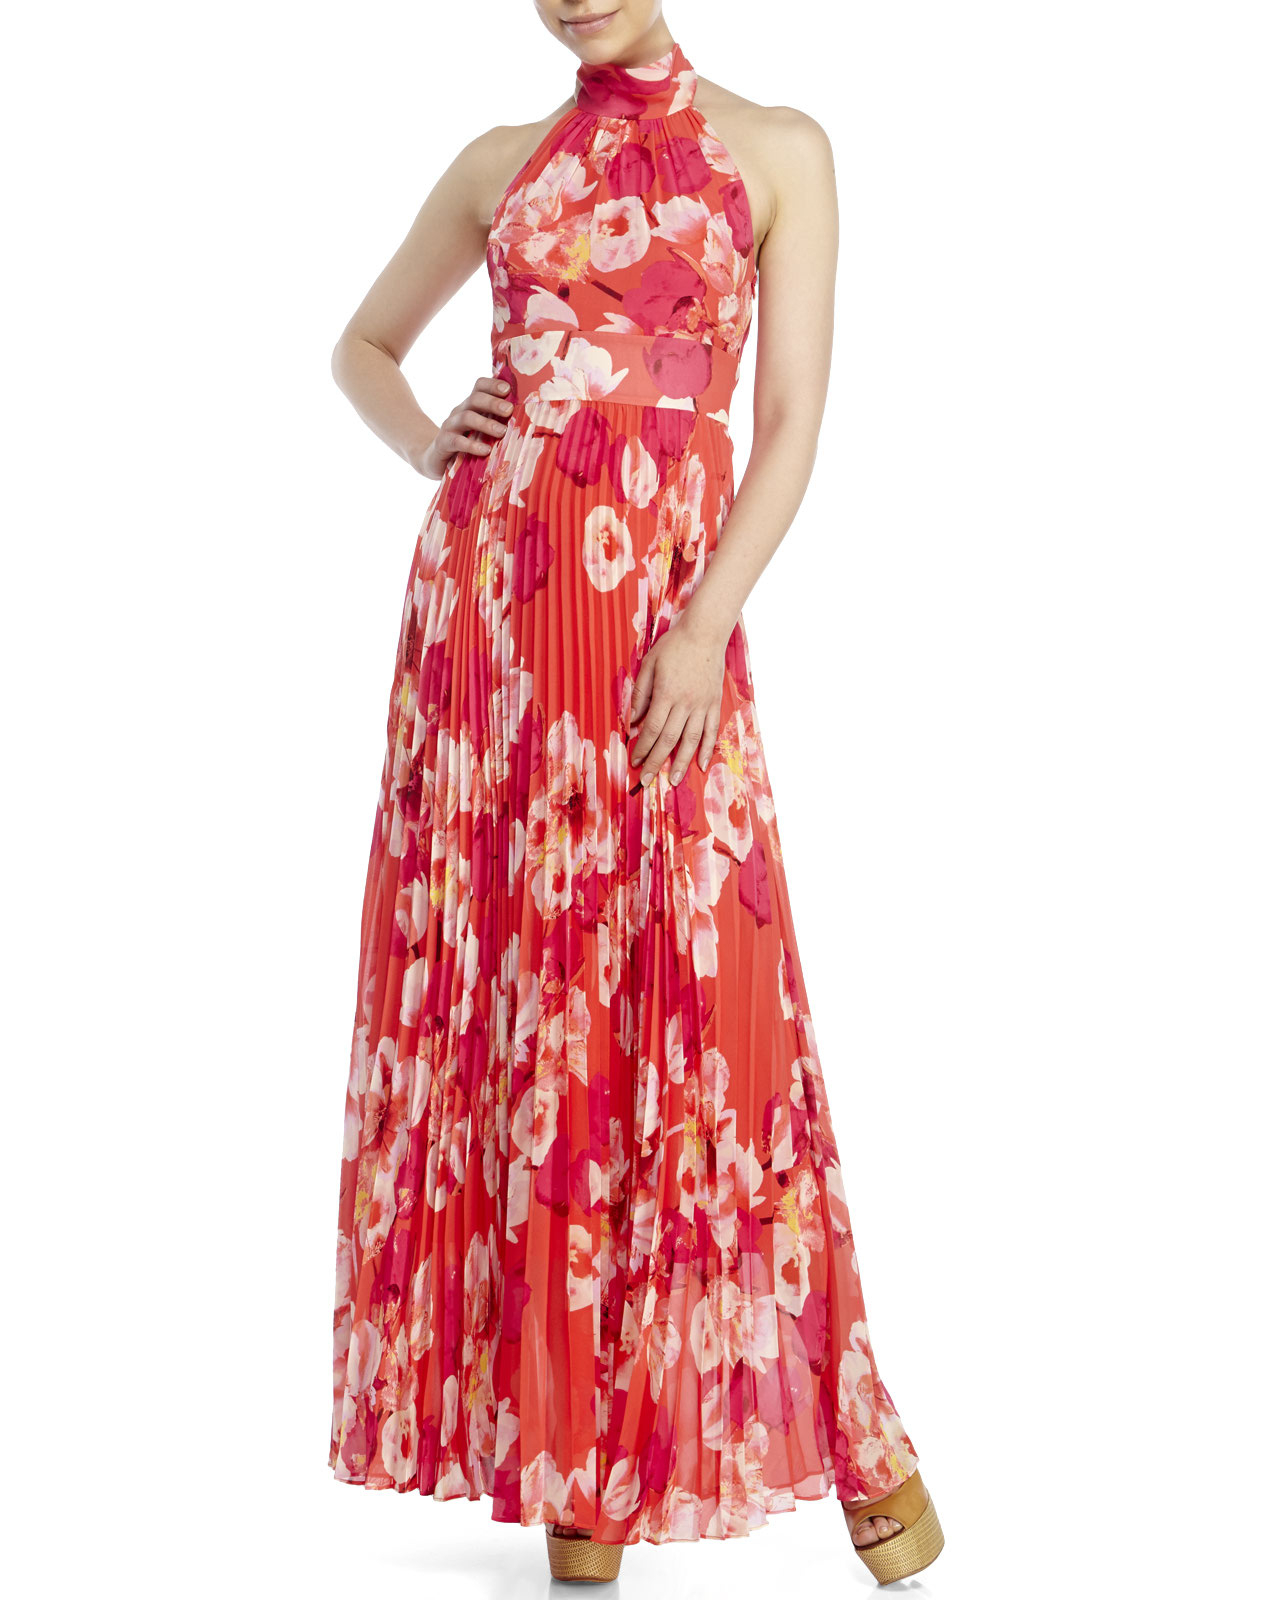 203111f71de4 Floral Print Chiffon Maxi Dress Eliza J - raveitsafe